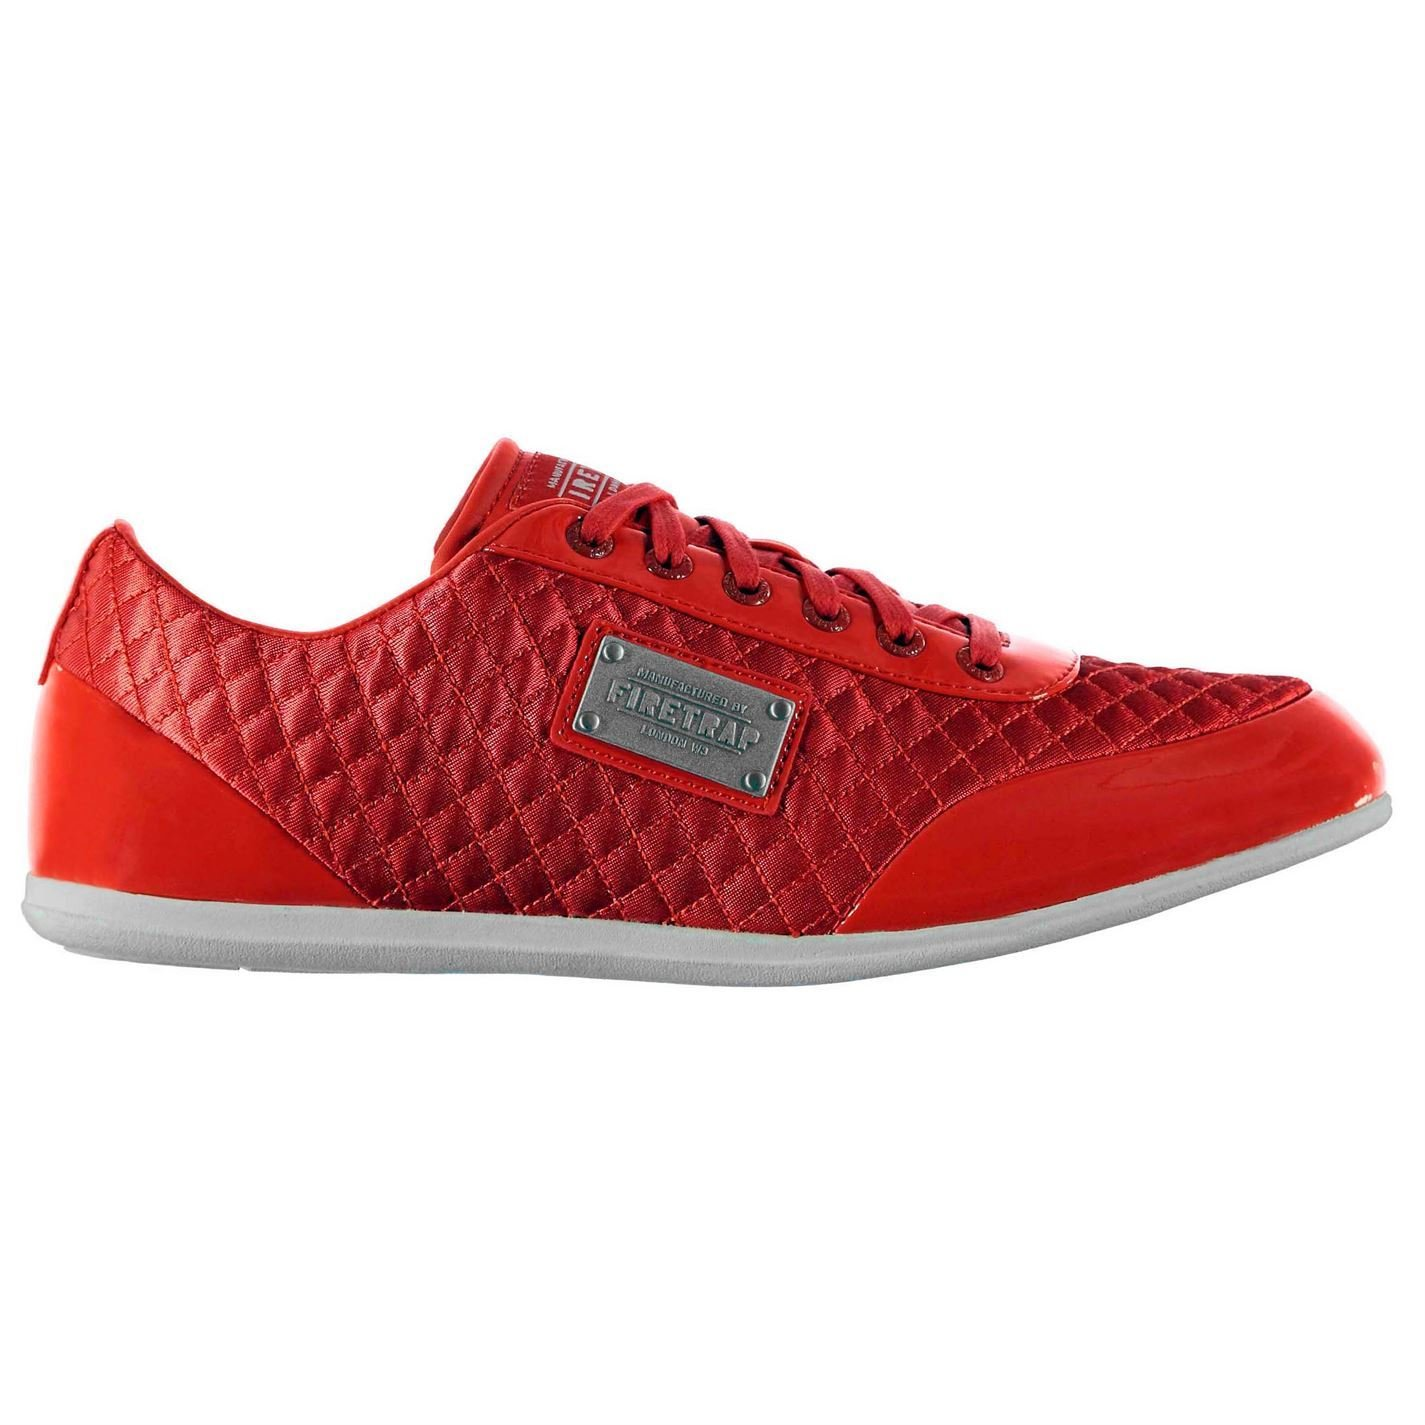 64add21ef0b Firetrap Dr Domello Casual Trainers Mens Red Fashion Trainers ...